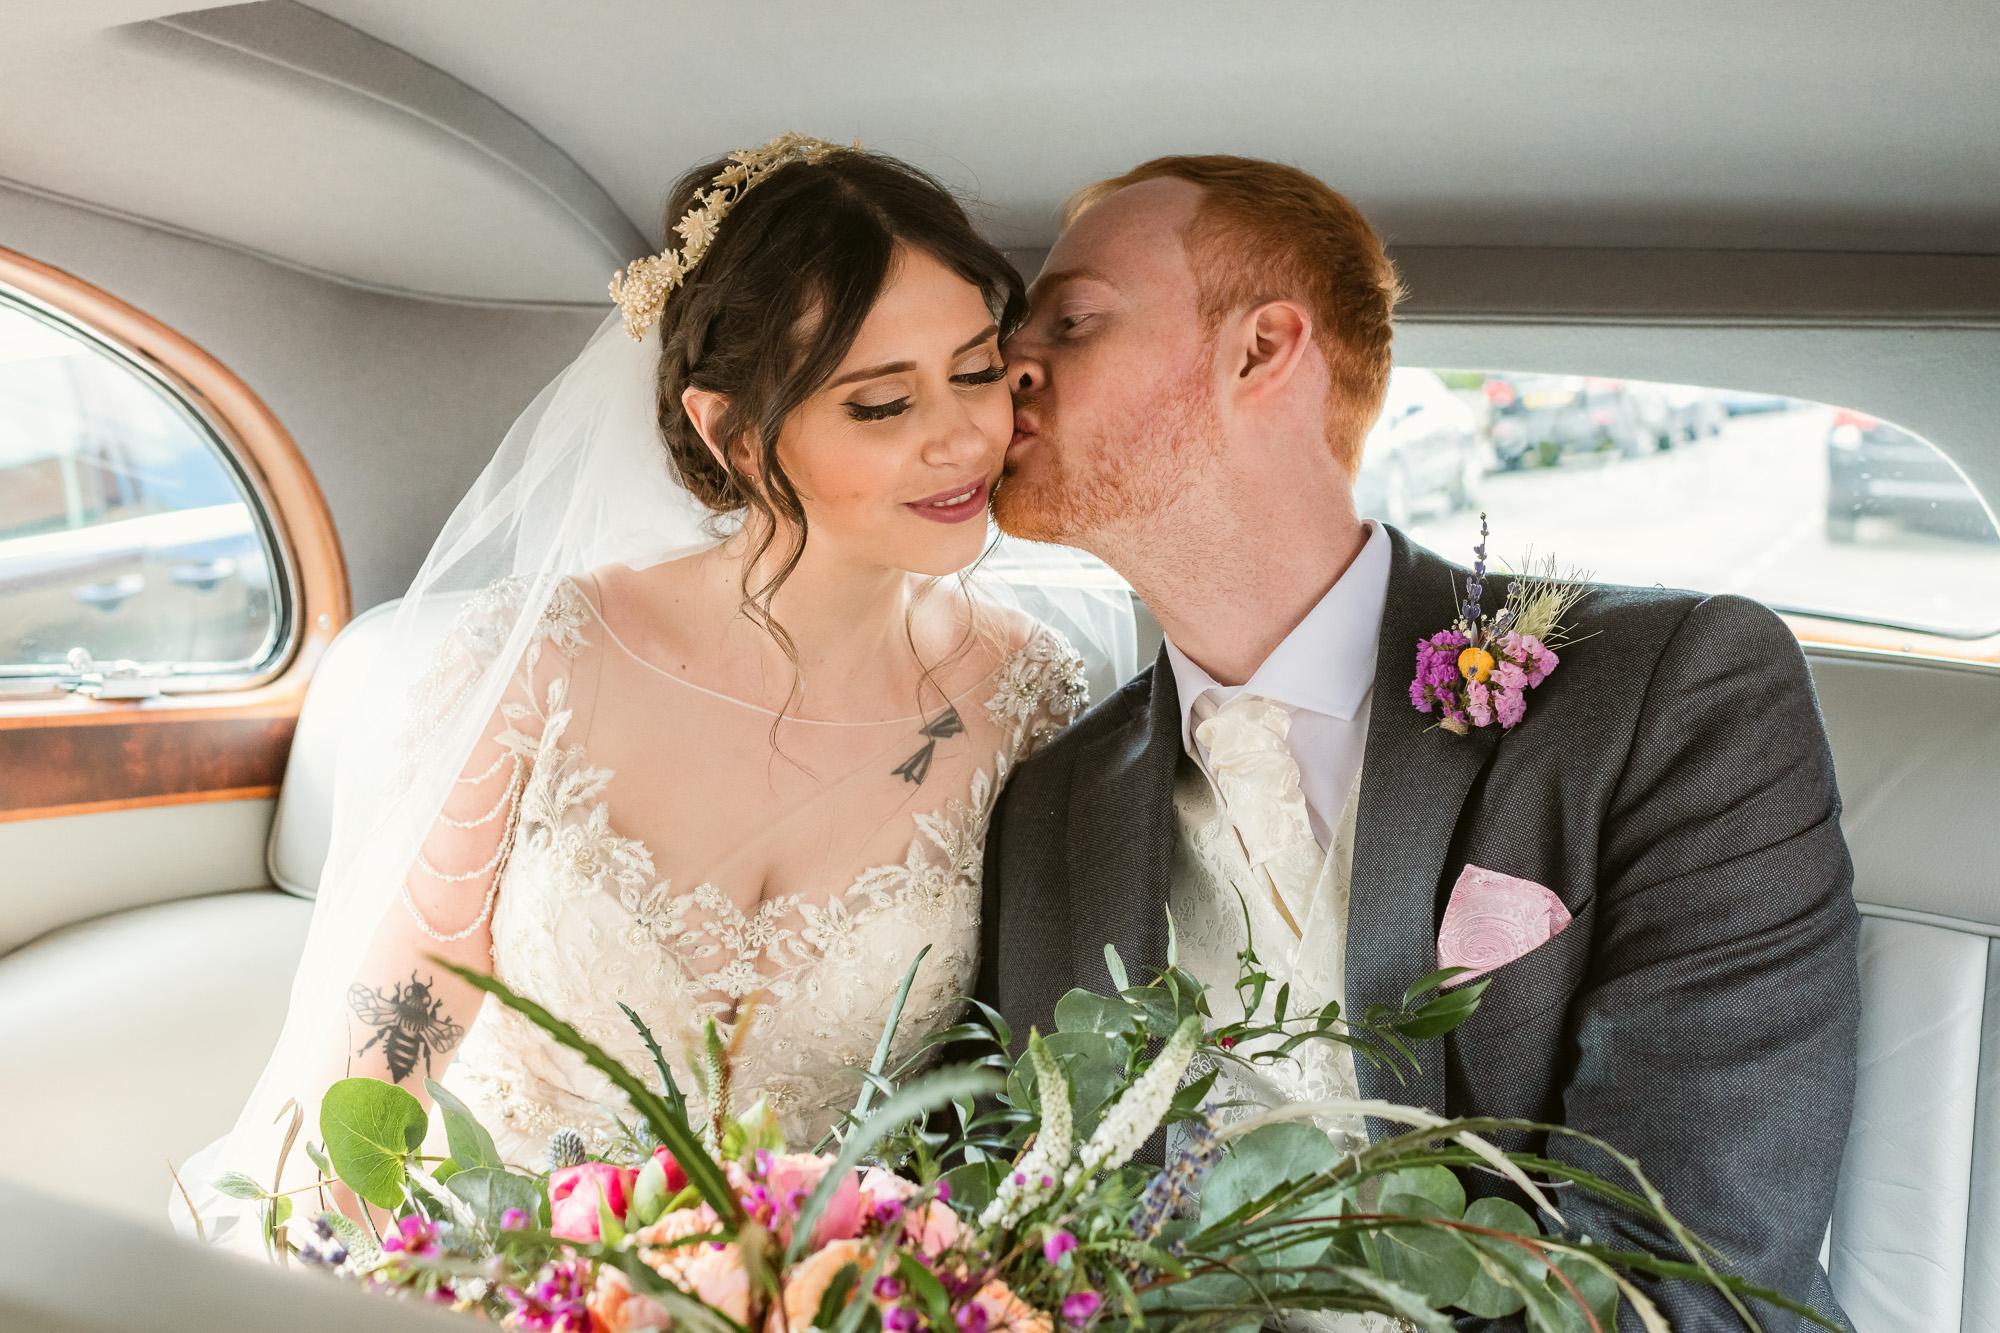 William Cecil wedding photography – Rebekah & Rhys